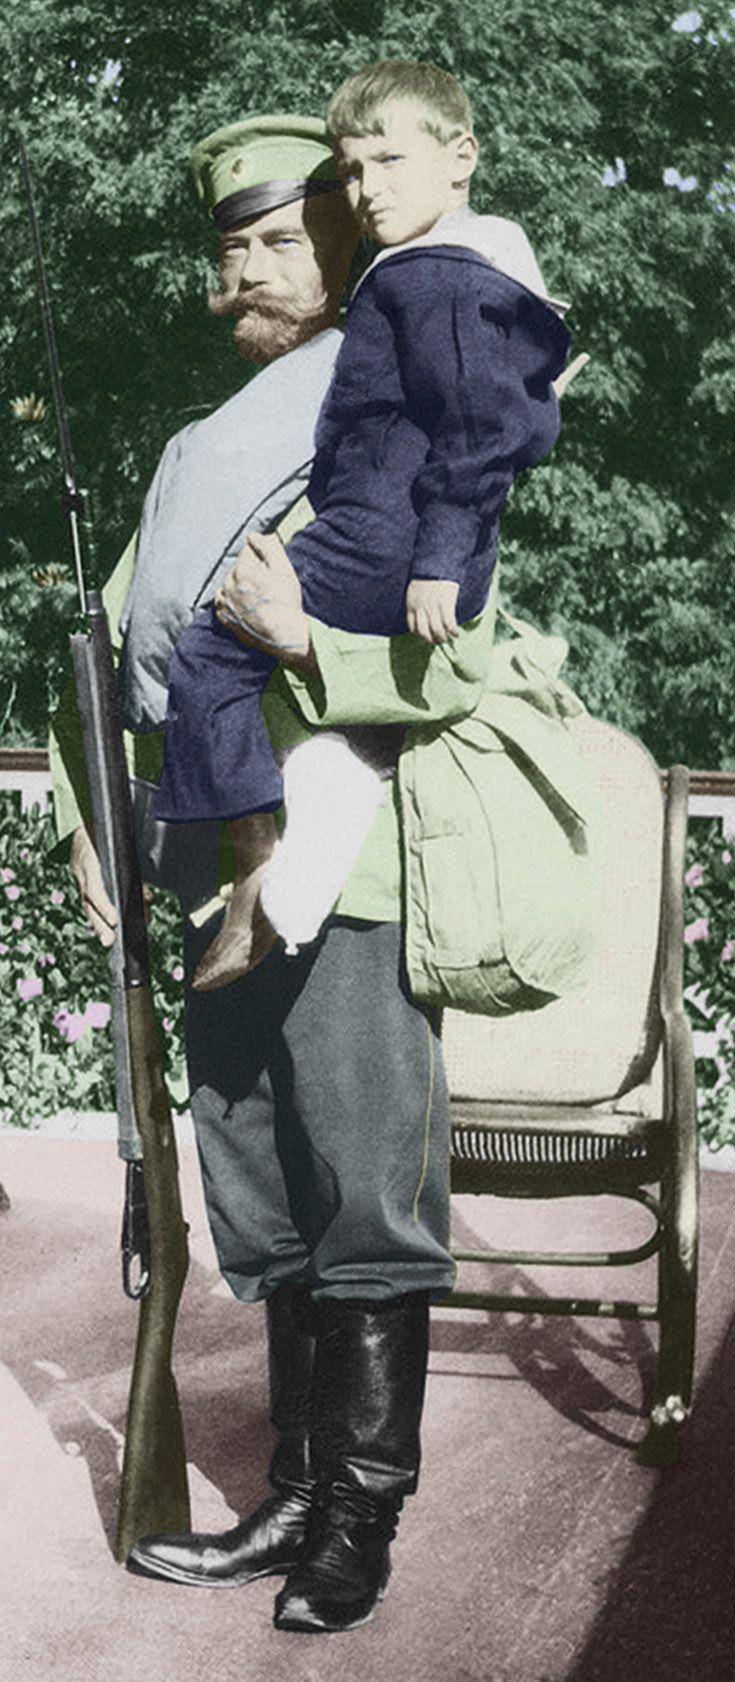 Tsar Nicholas II and his son Alexei from Romanov Photo album Vol 4 (Yale)-200